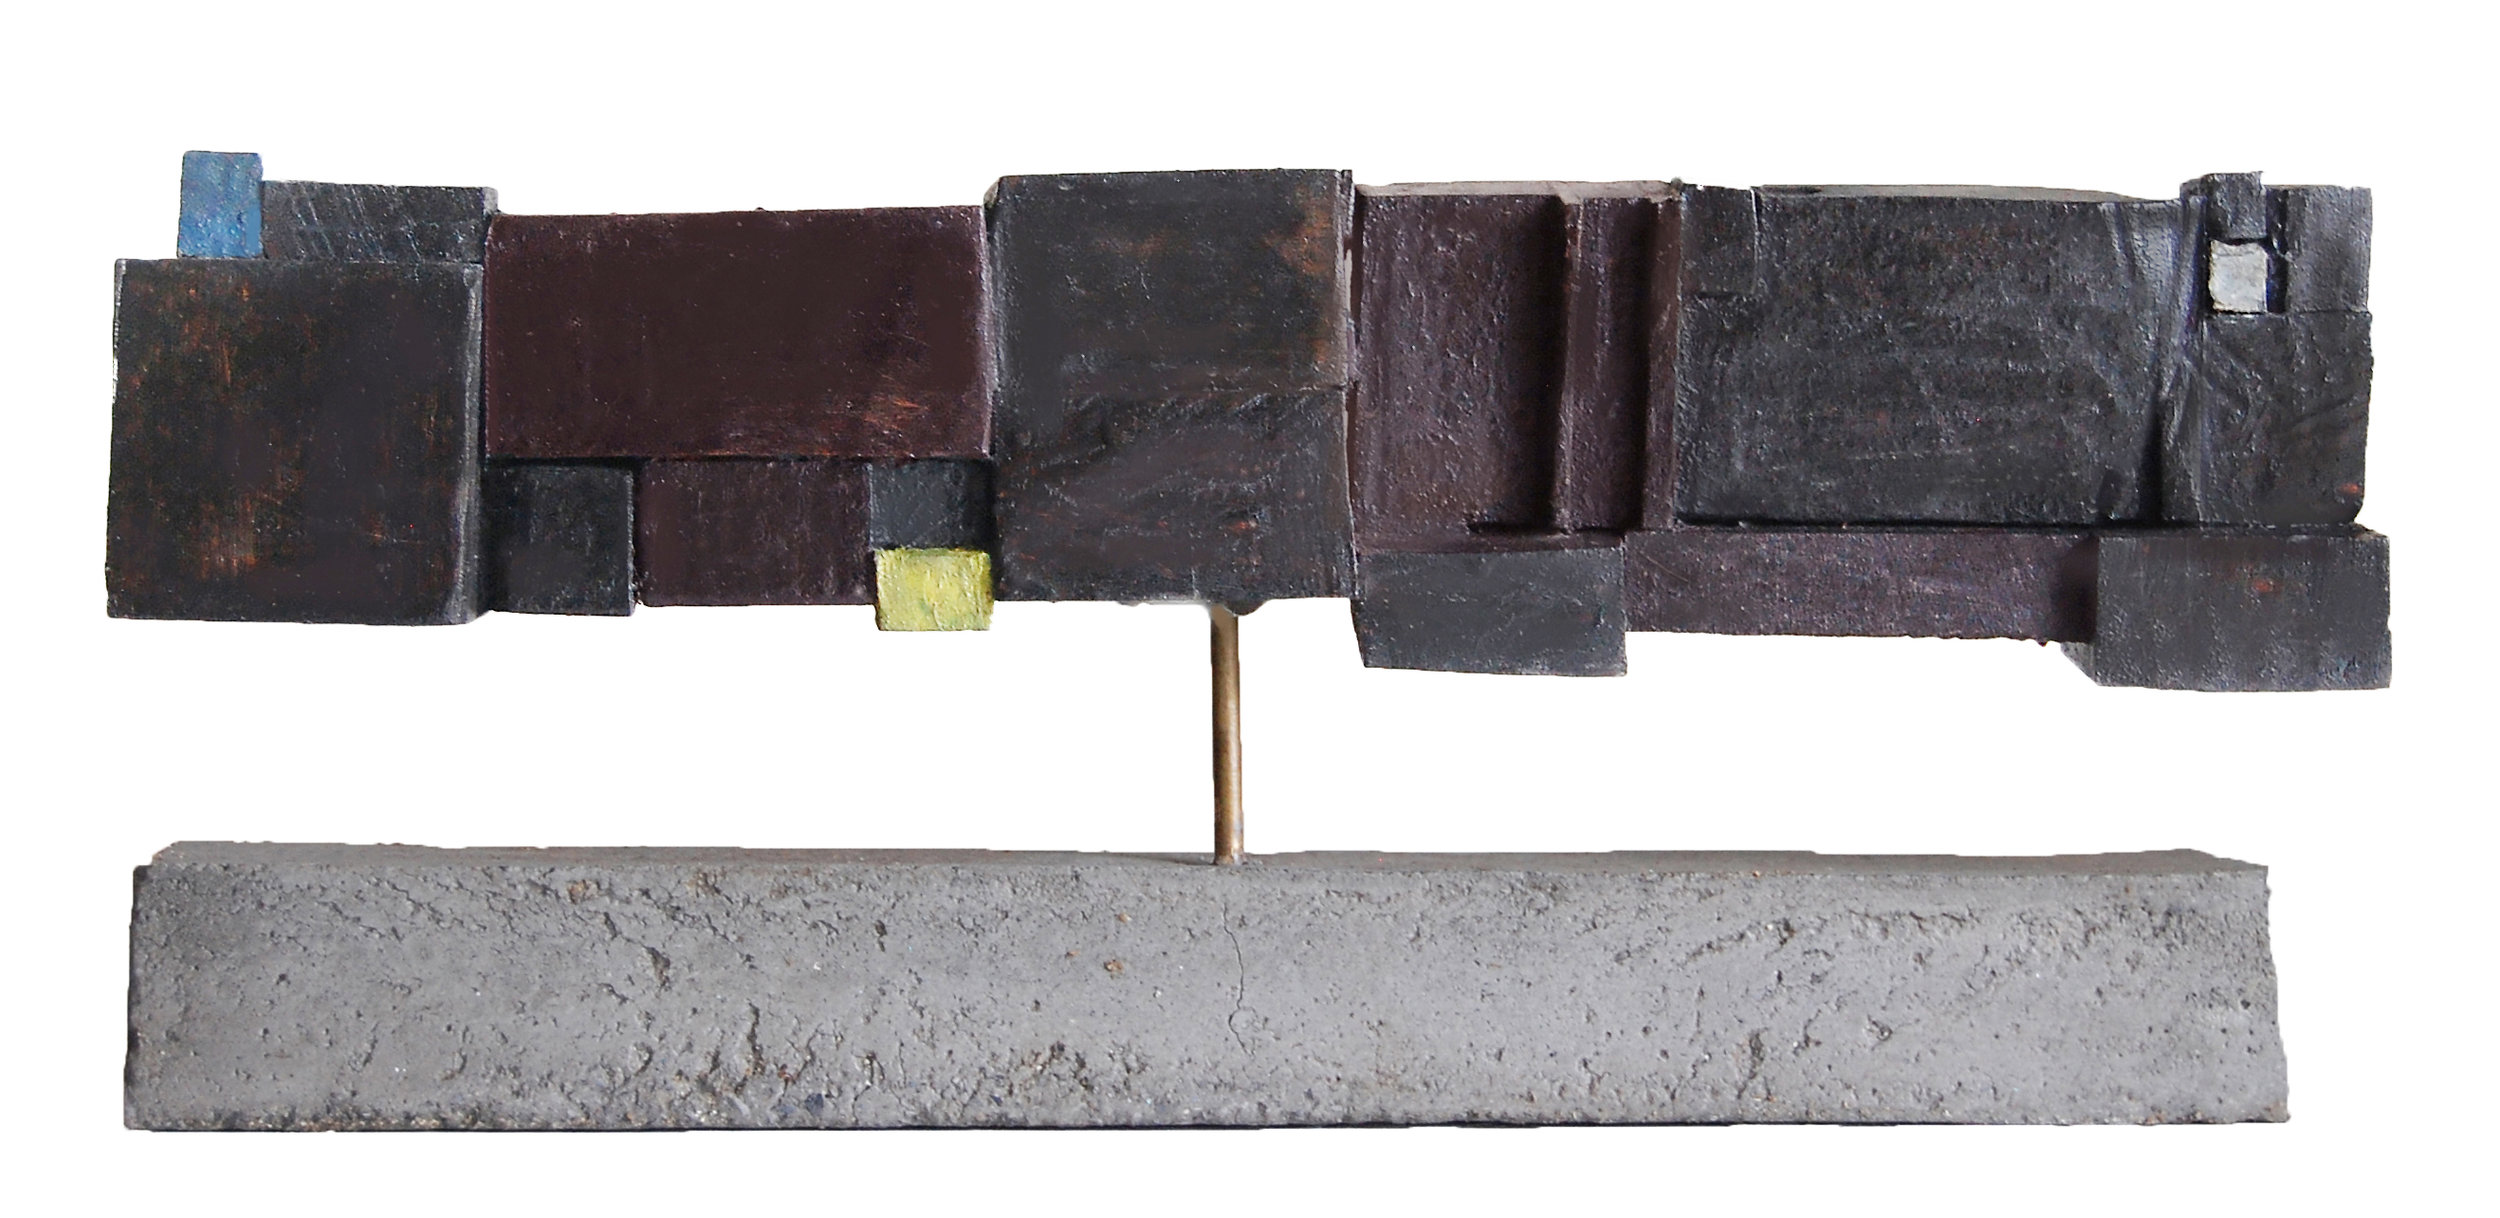 Antigone, 2019, wood, marble, bronze, 16  X 6 in,  $3000